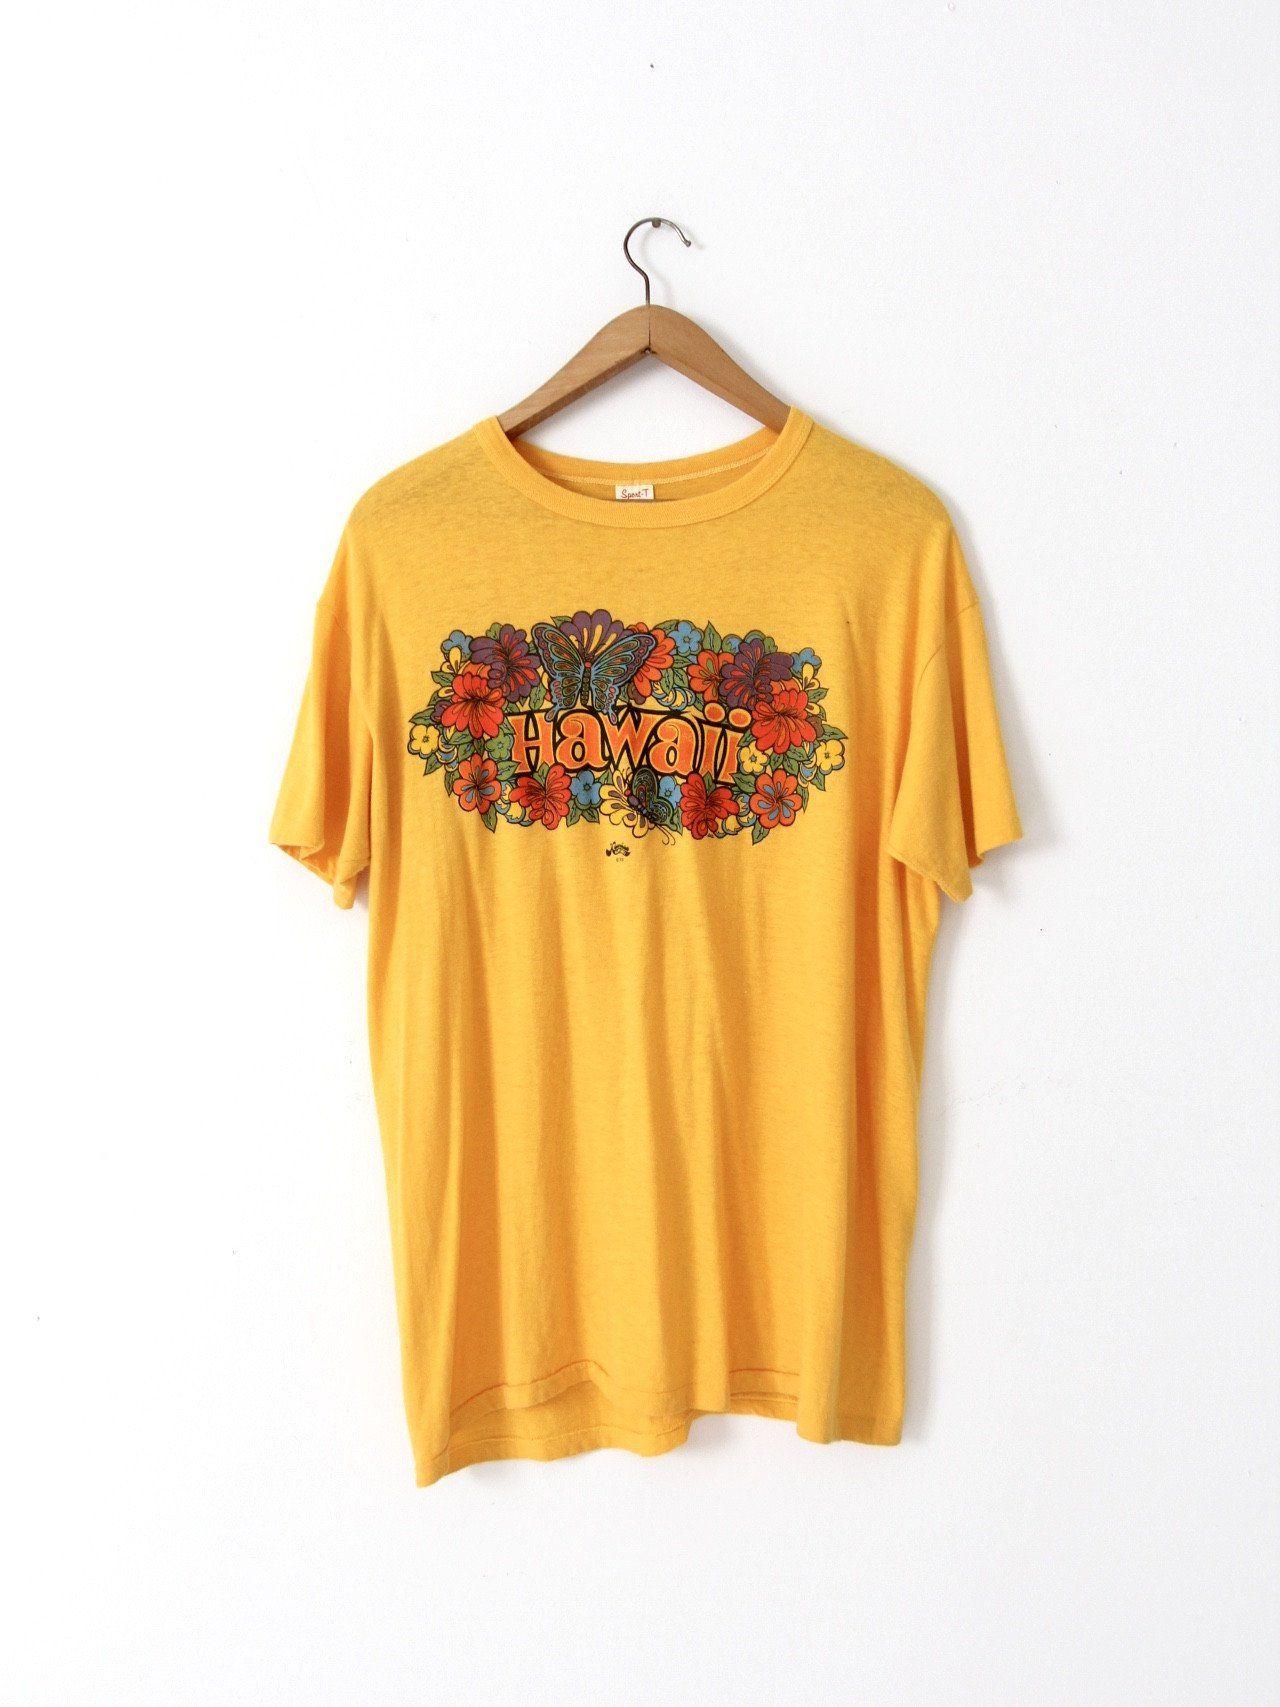 b0c4693c vintage 70s Hawaii graphic t-shirt | Products | Vintage hawaii, T ...